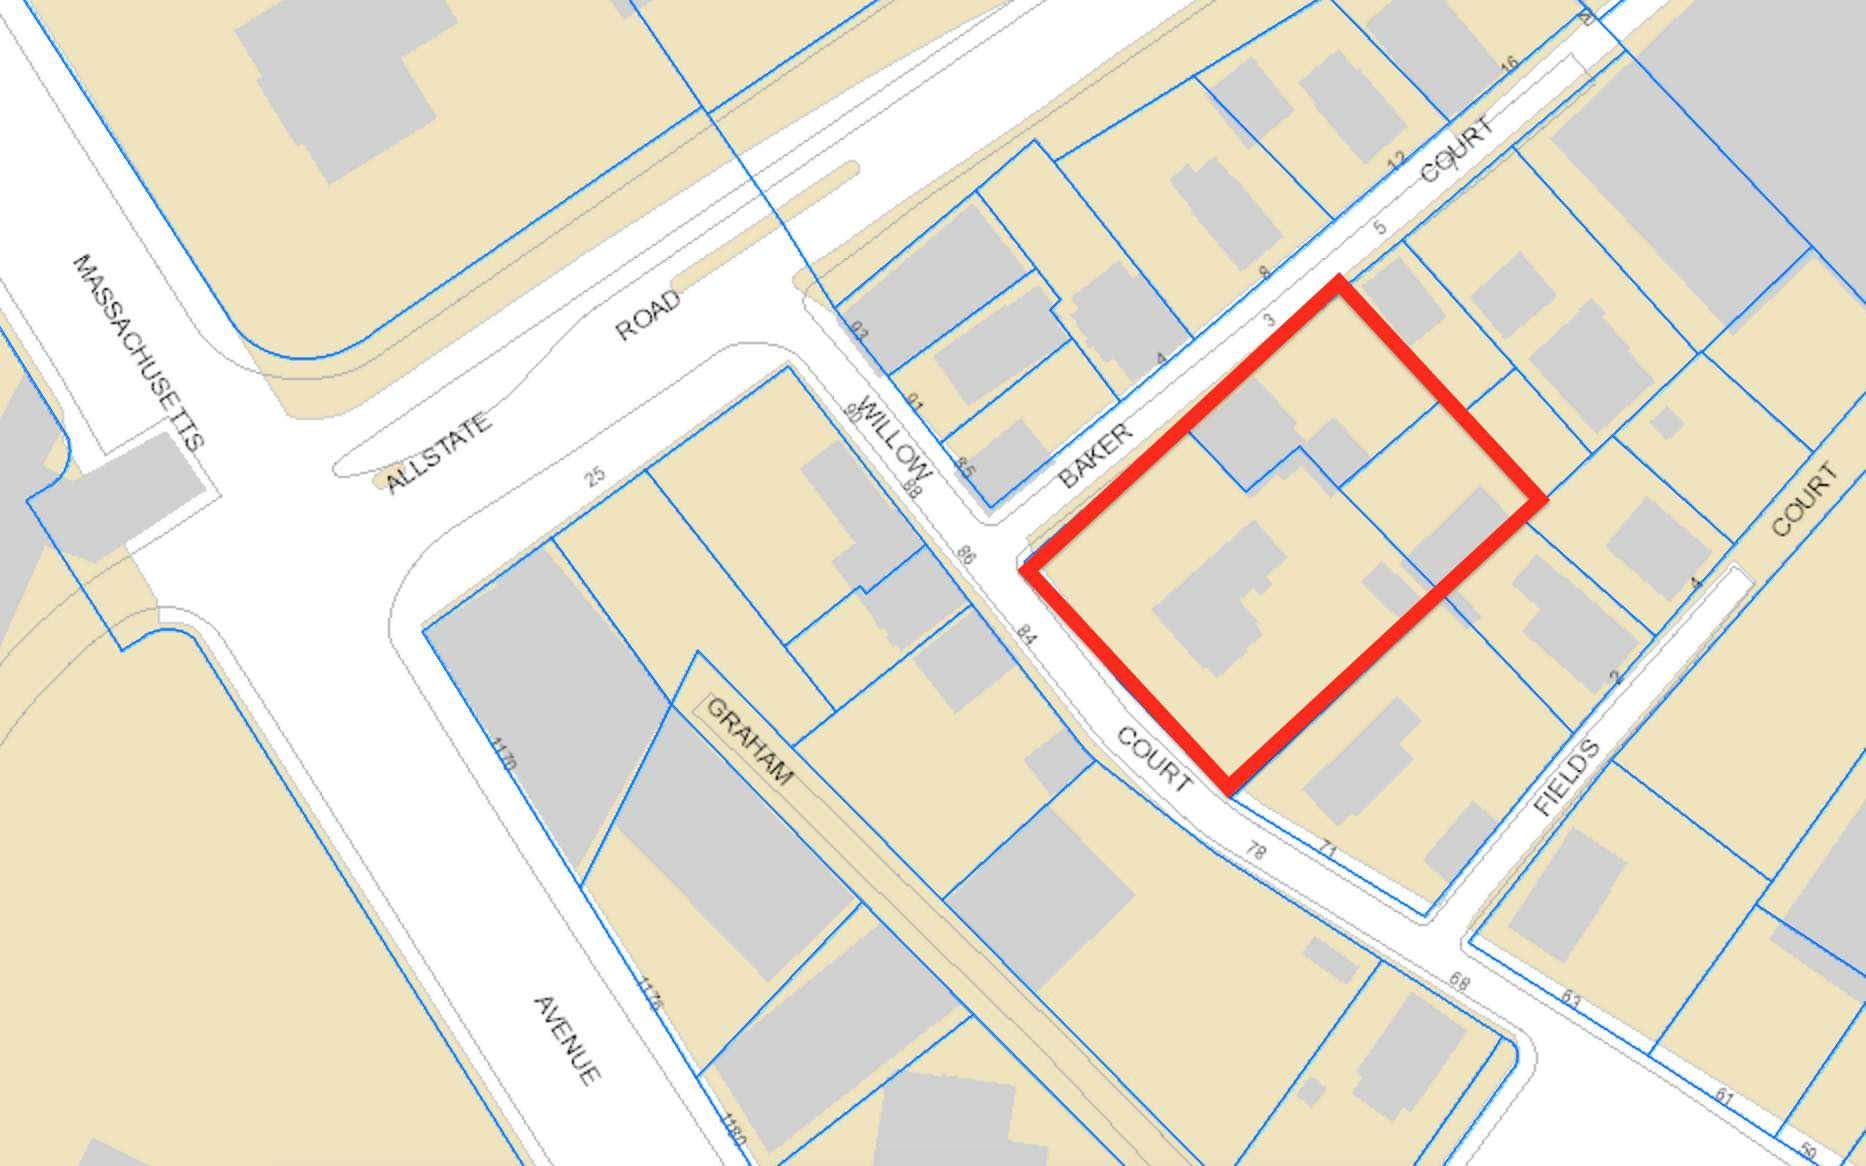 79 willow court 3 baker court dorchester south bay development site cornerstone real estate